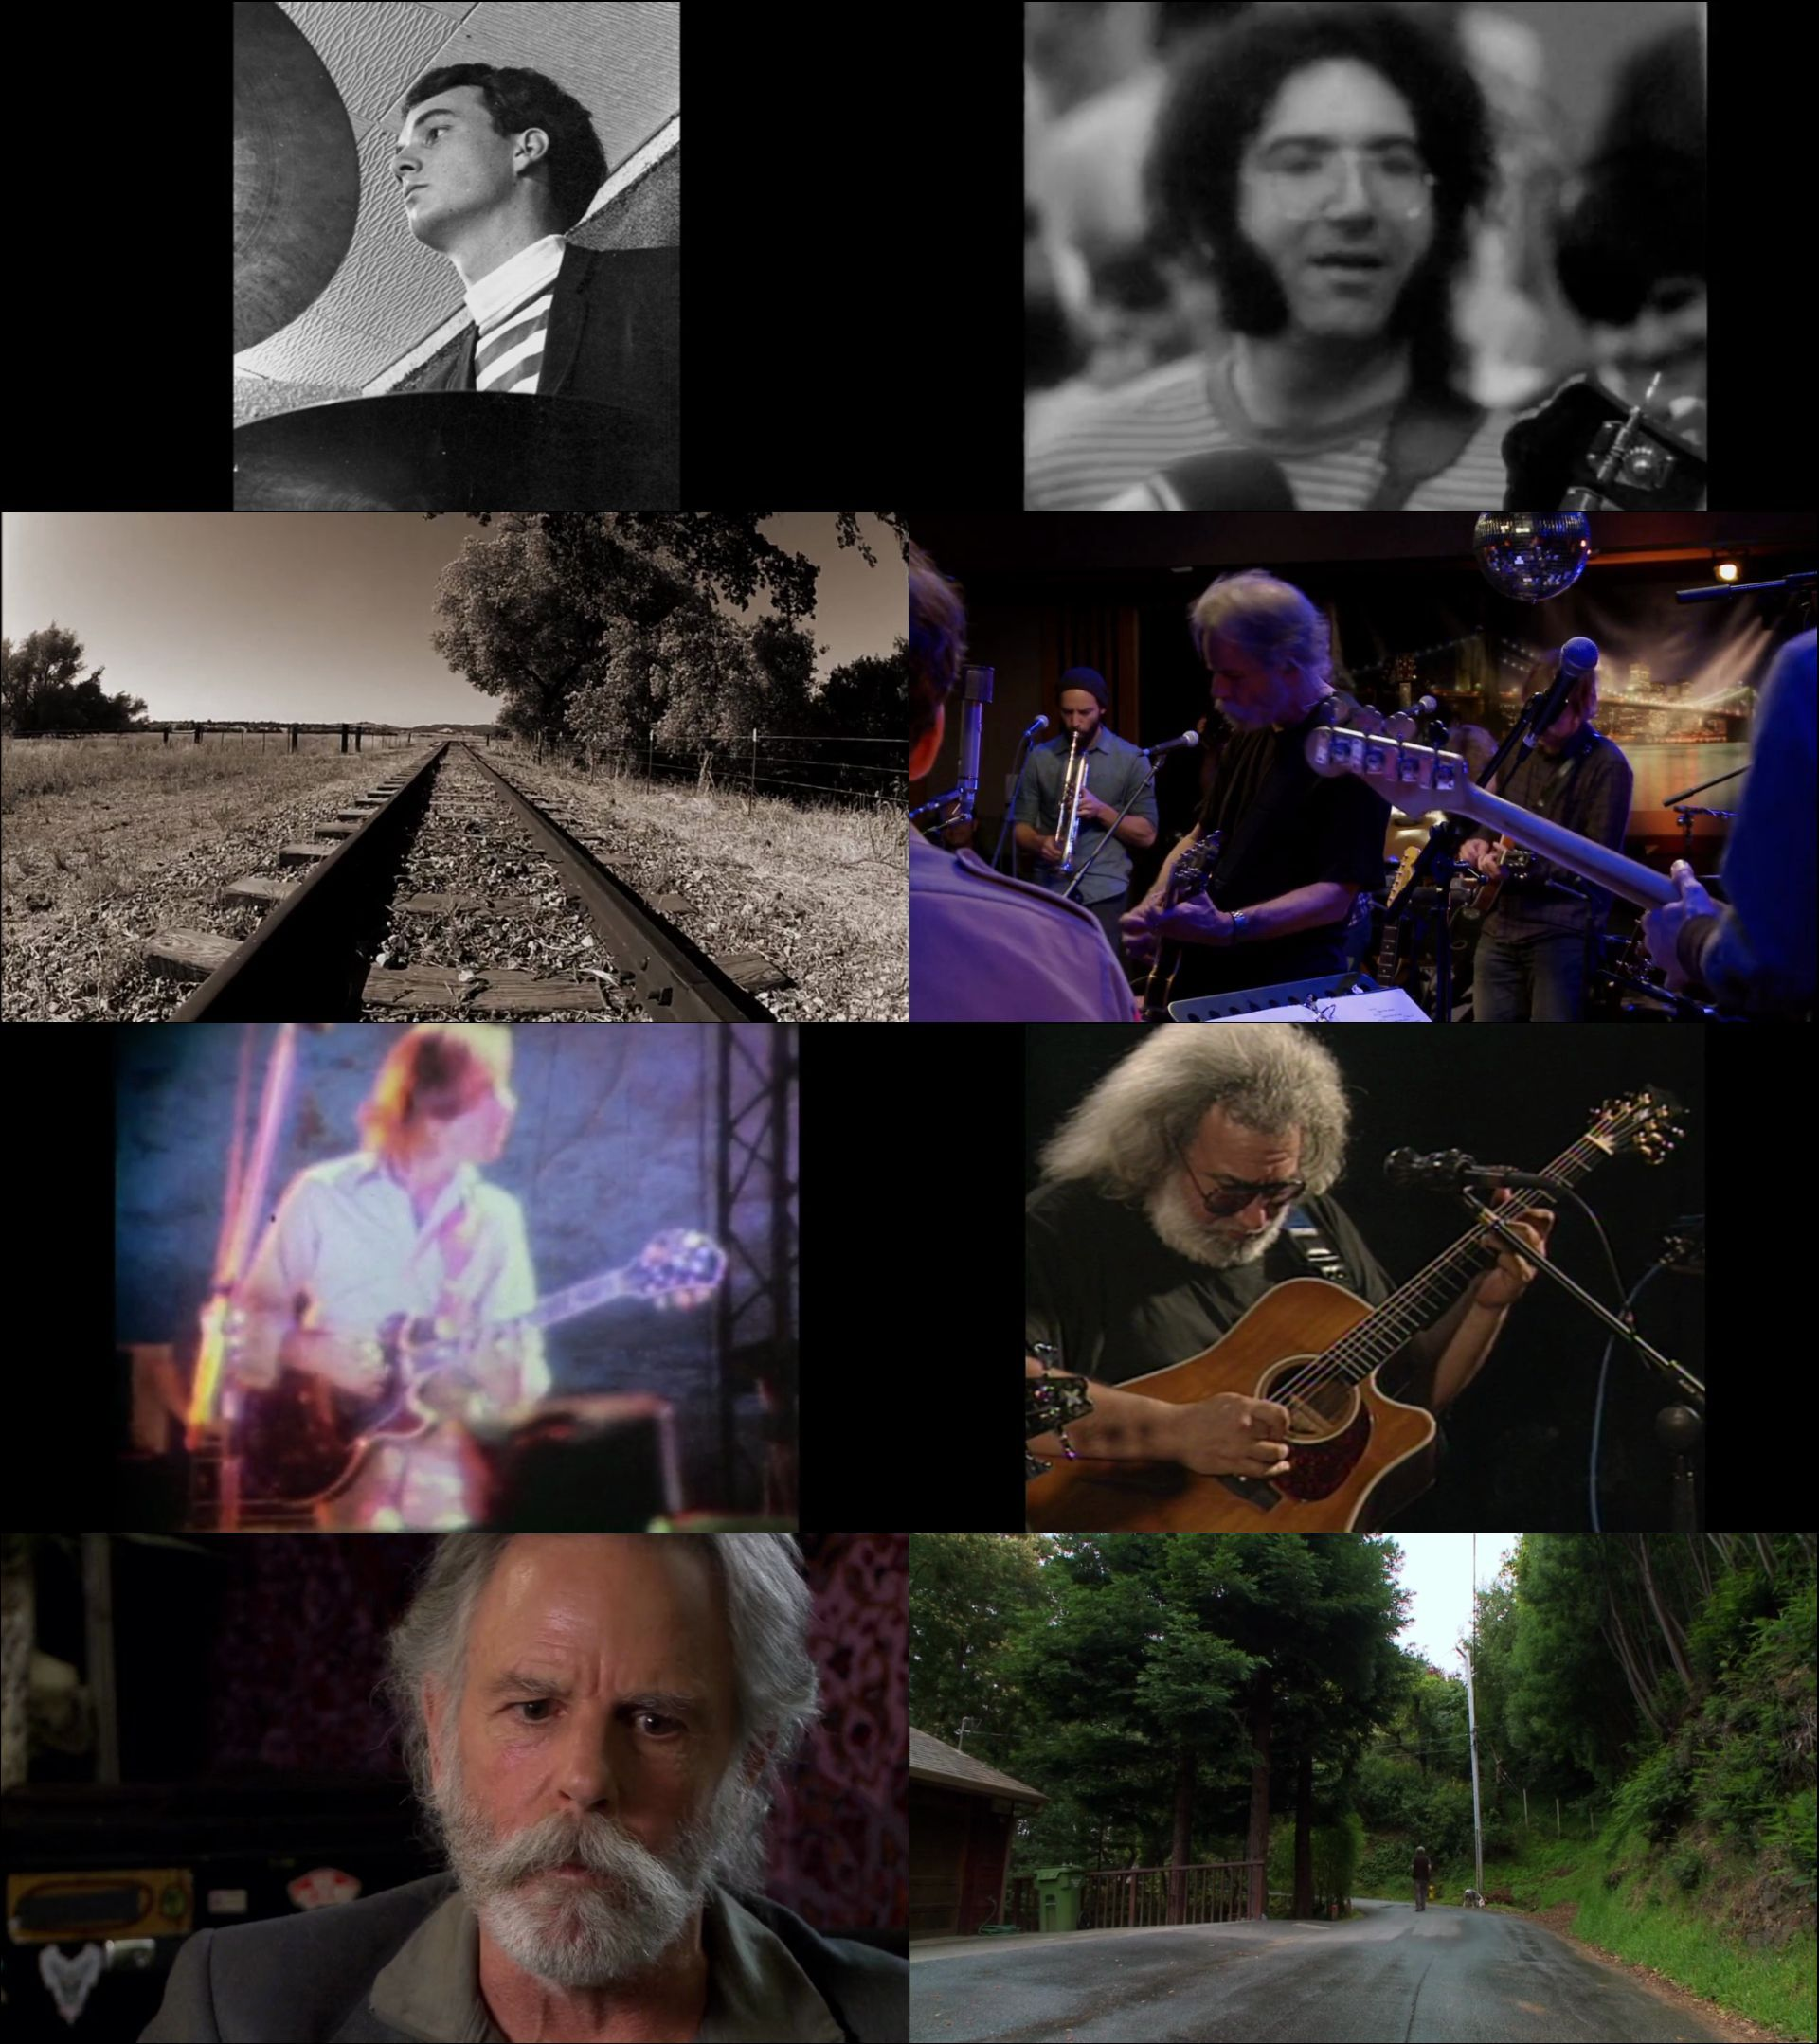 The Other One: The Long, Strange Trip of Bob Weir (2014) türkçe dublaj belgesel indir